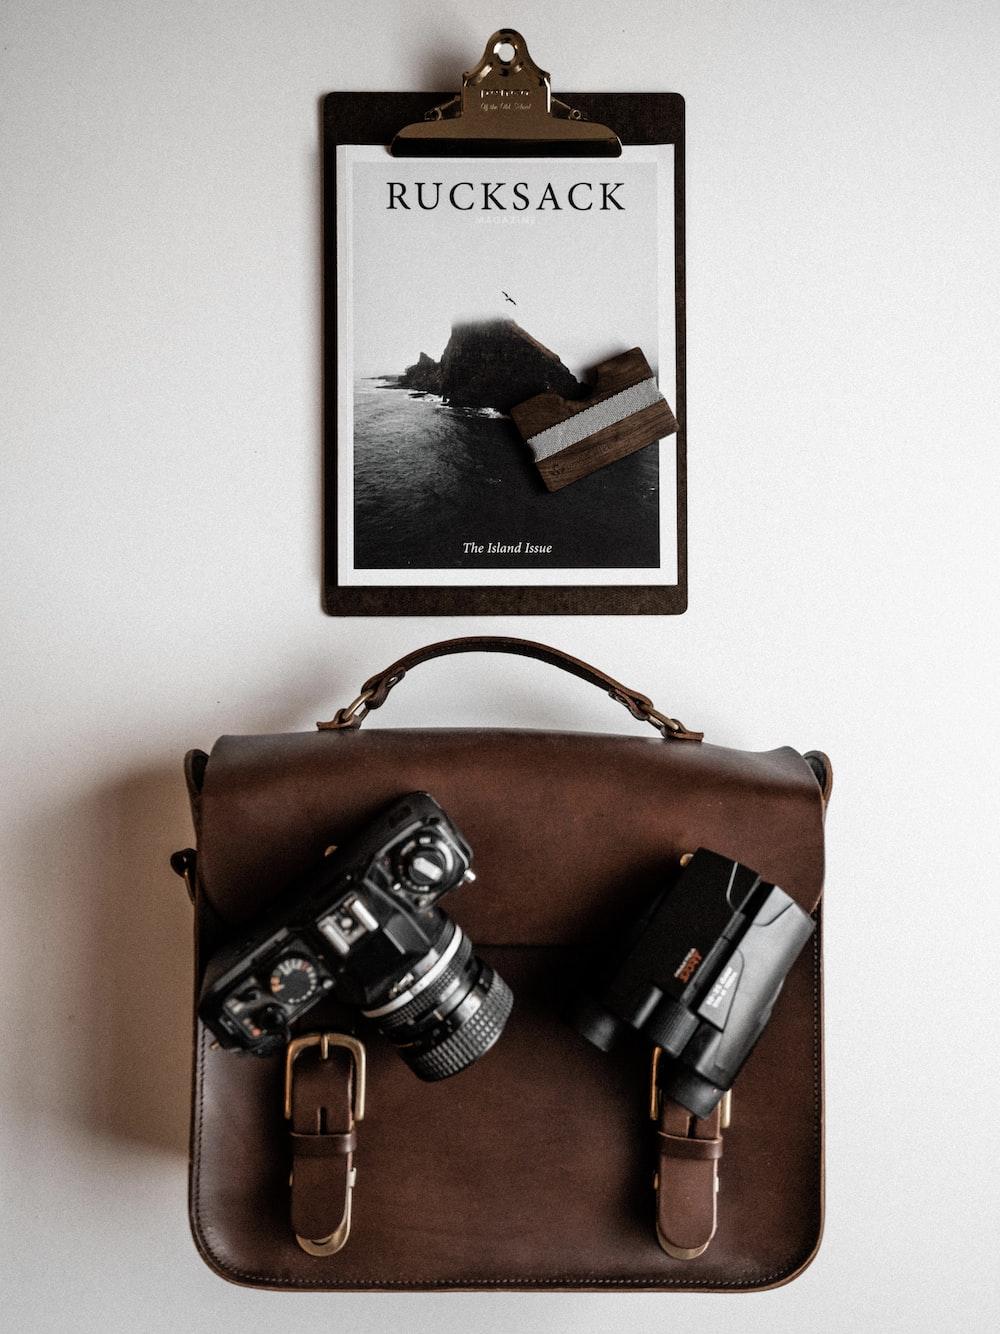 Rucksack paper board and DSLR camera on top of bag